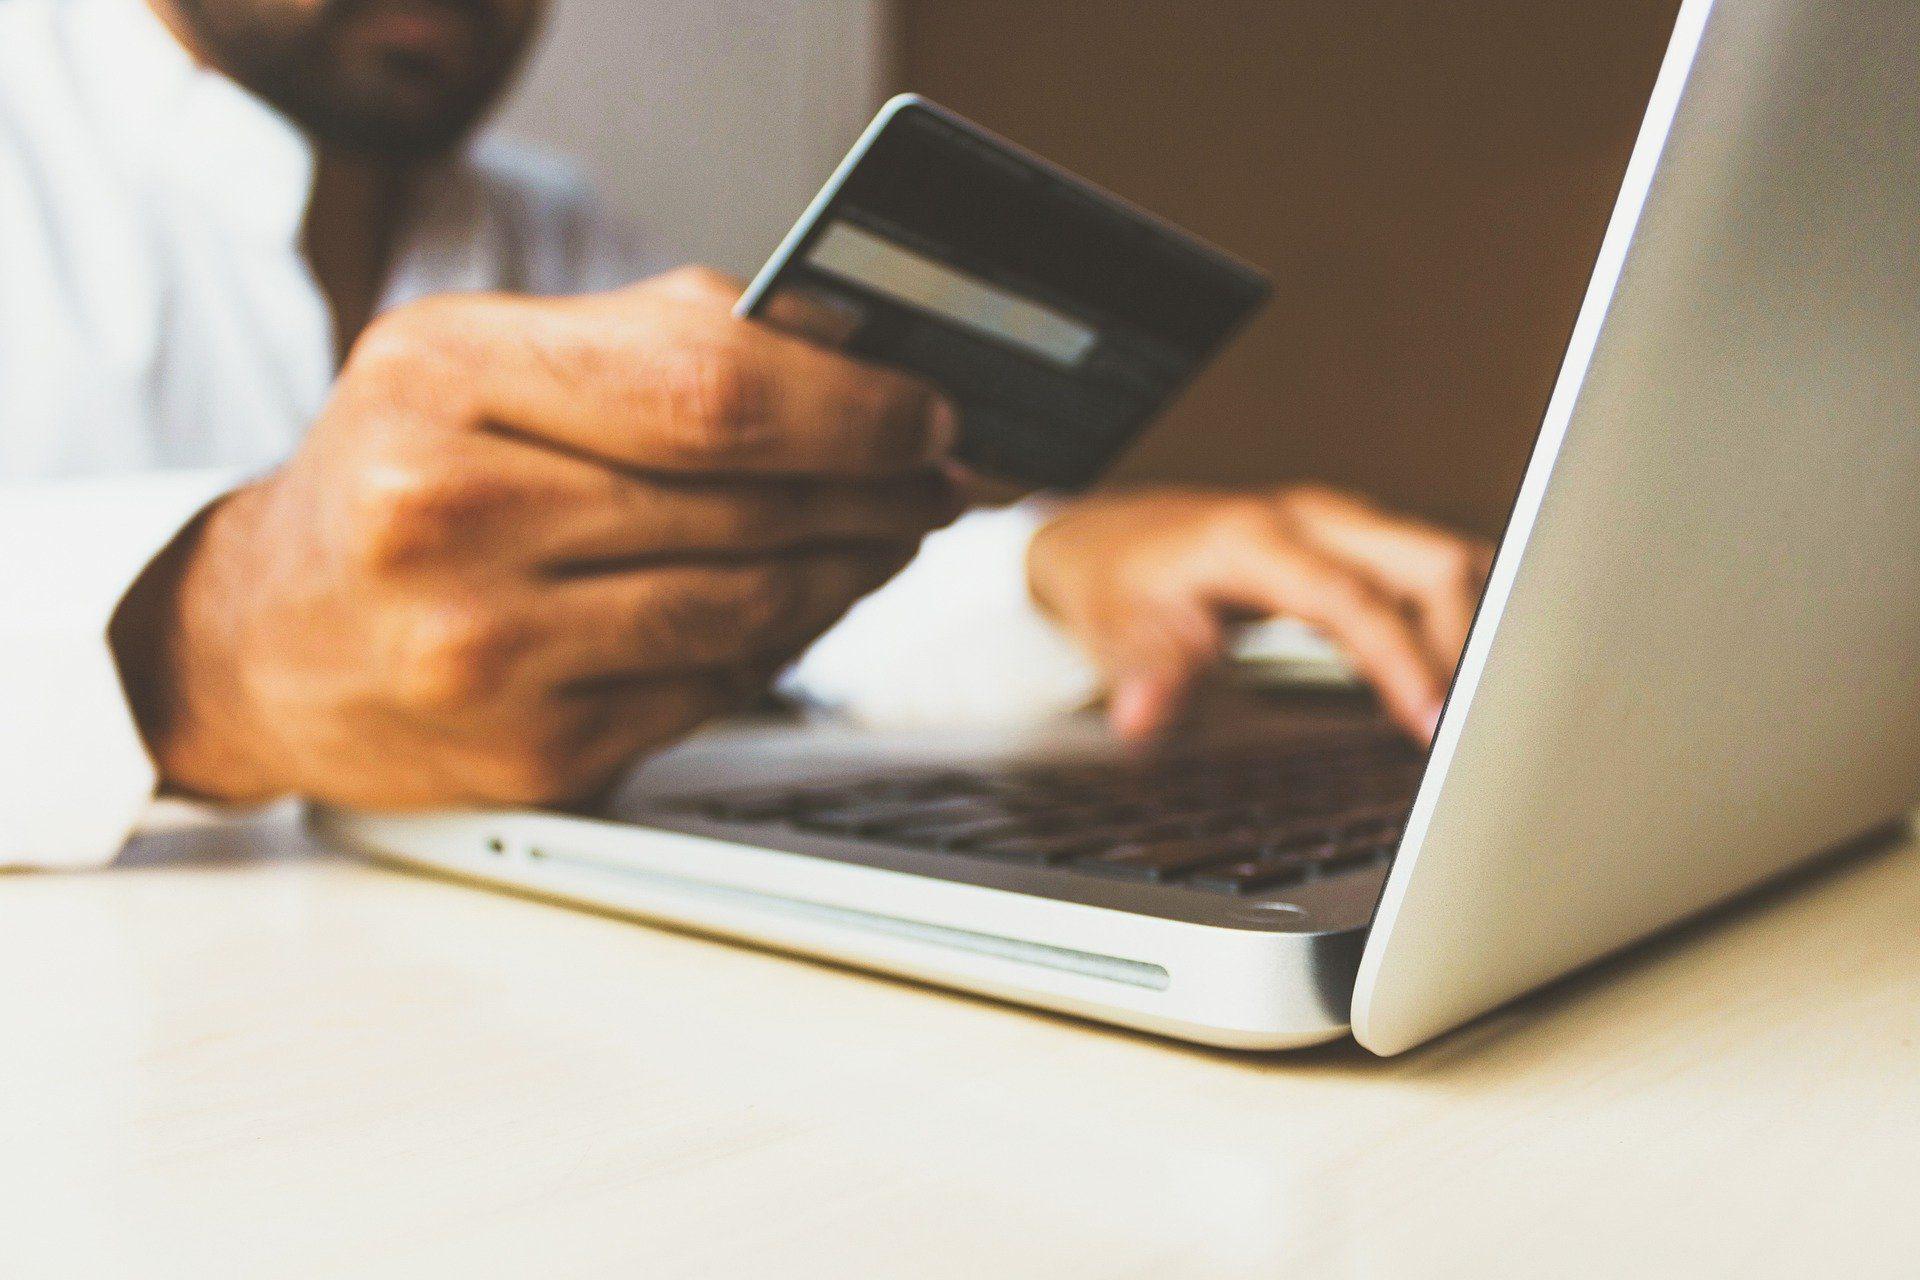 Utilisation frauduleuse carte bancaire